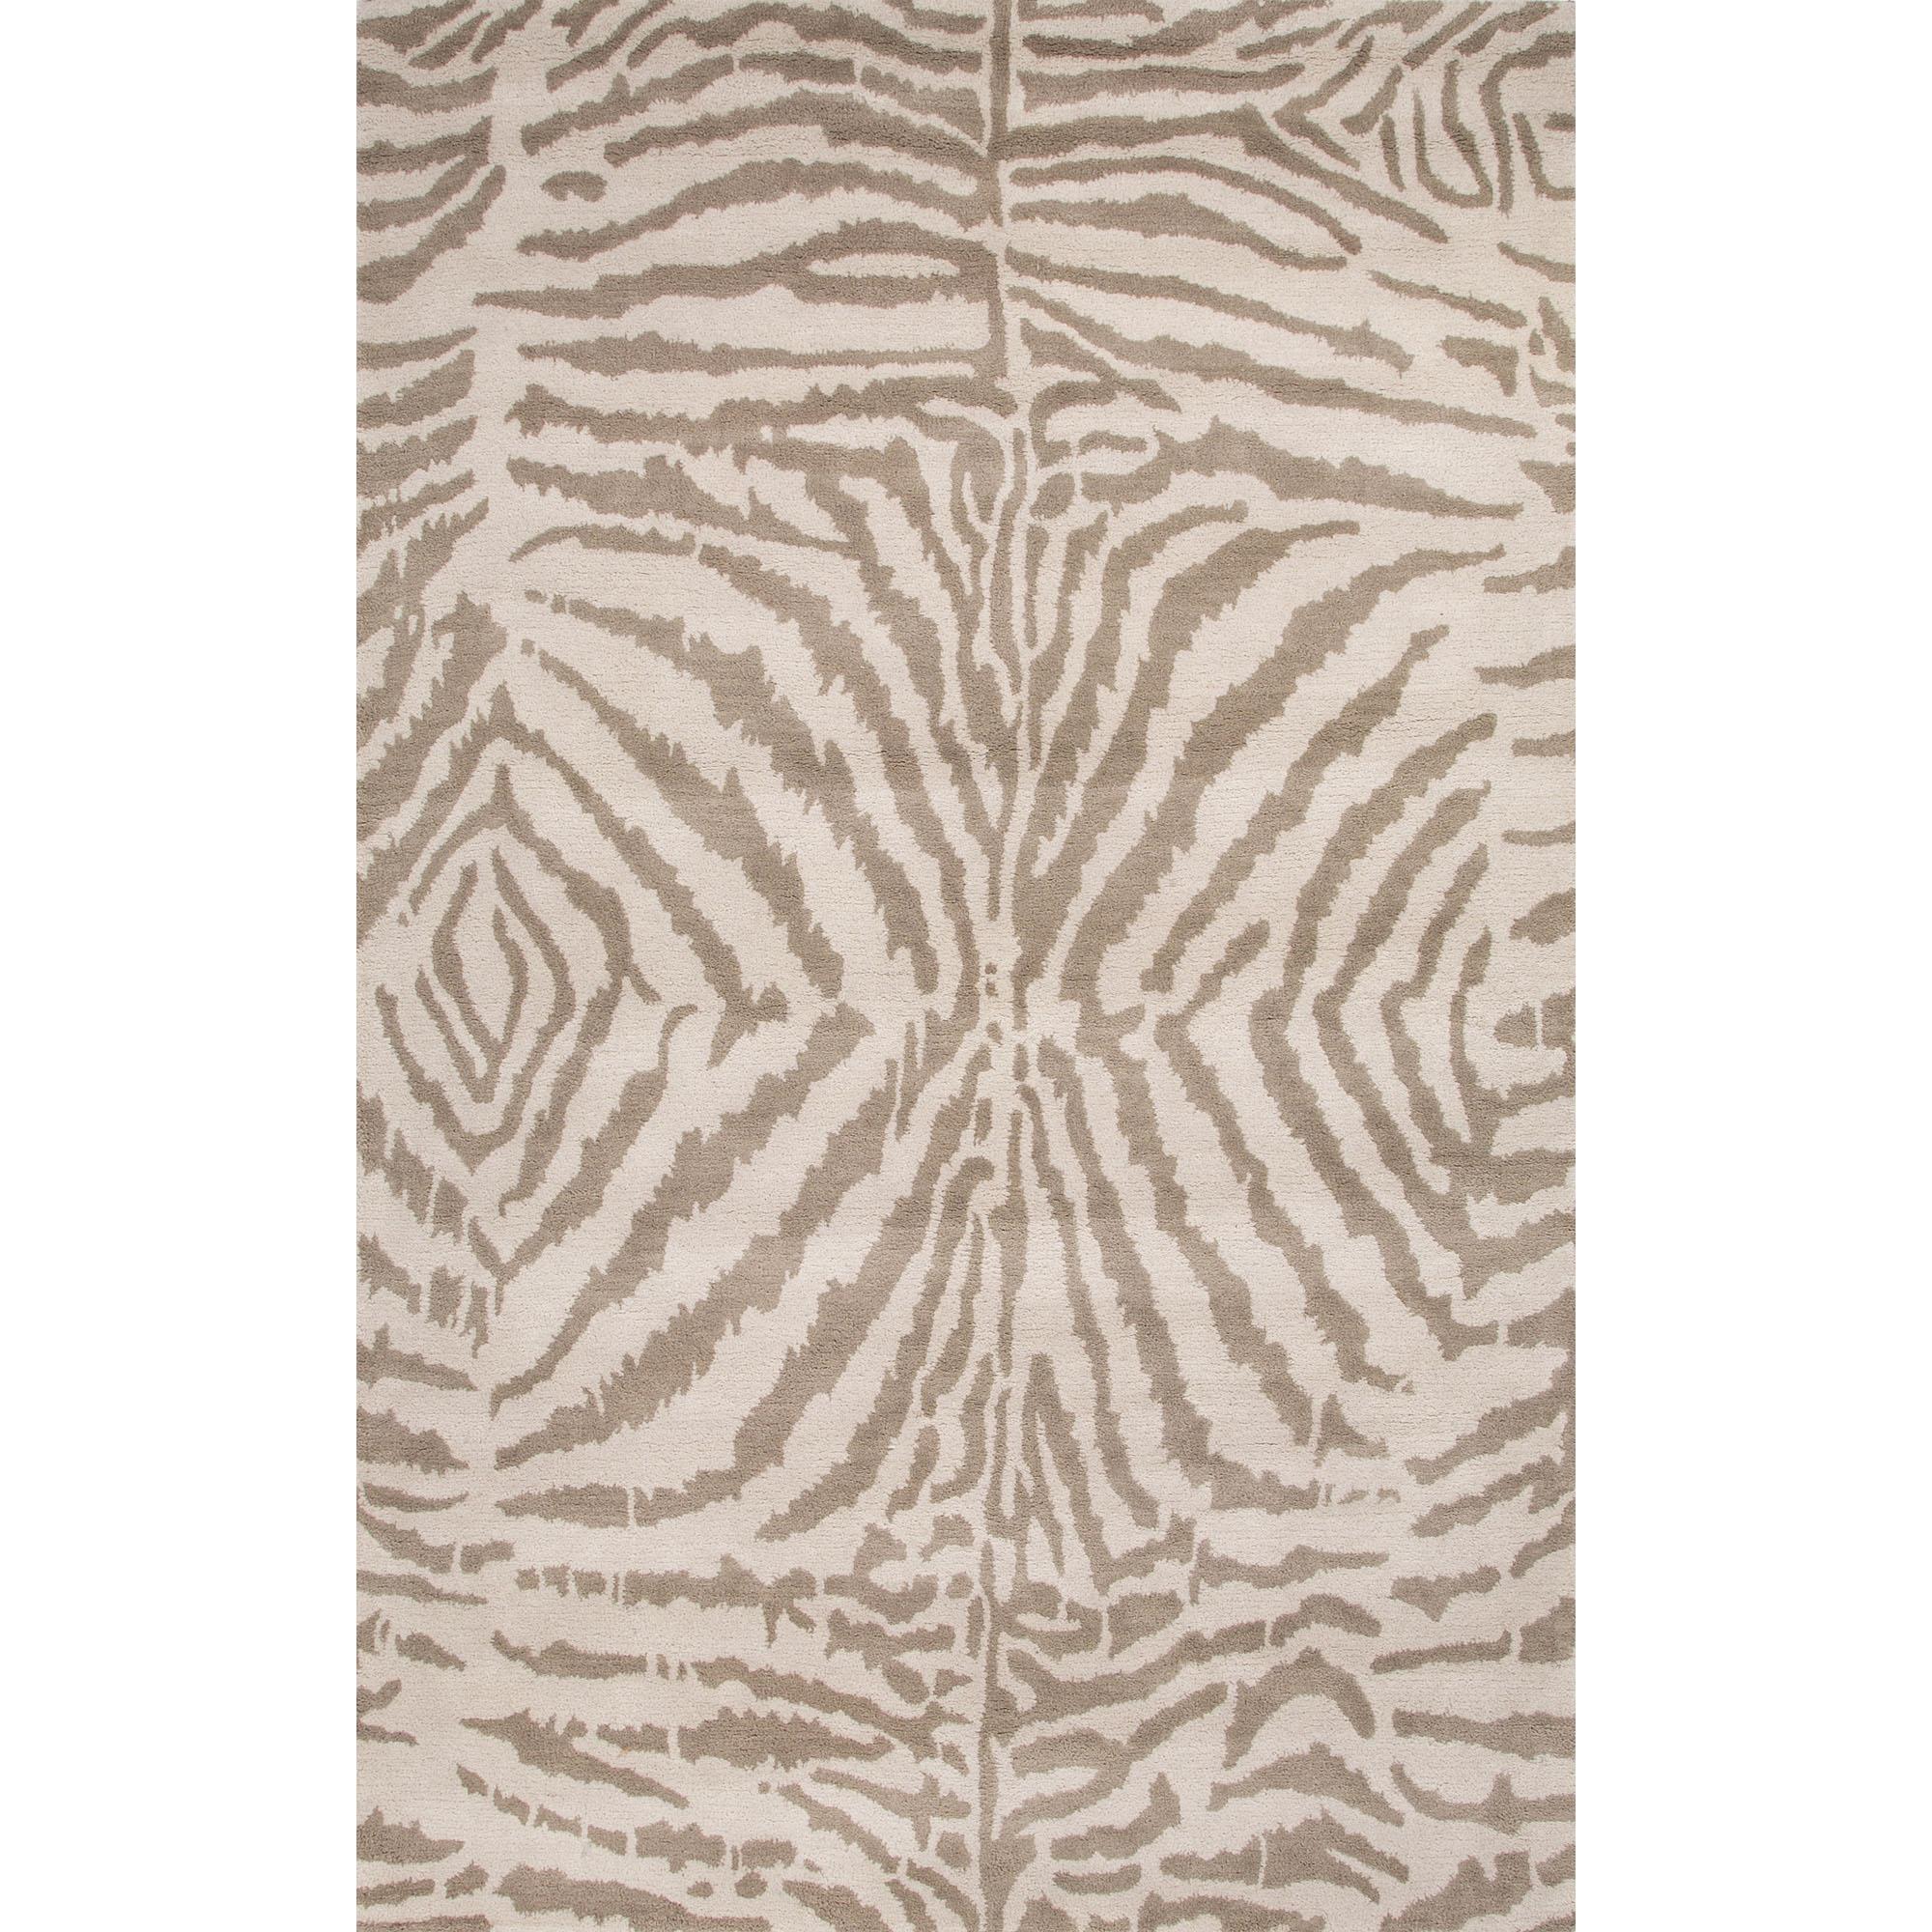 JAIPUR Rugs En Casa By Luli Sanchez Tufted 2 x 3 Rug - Item Number: RUG118141